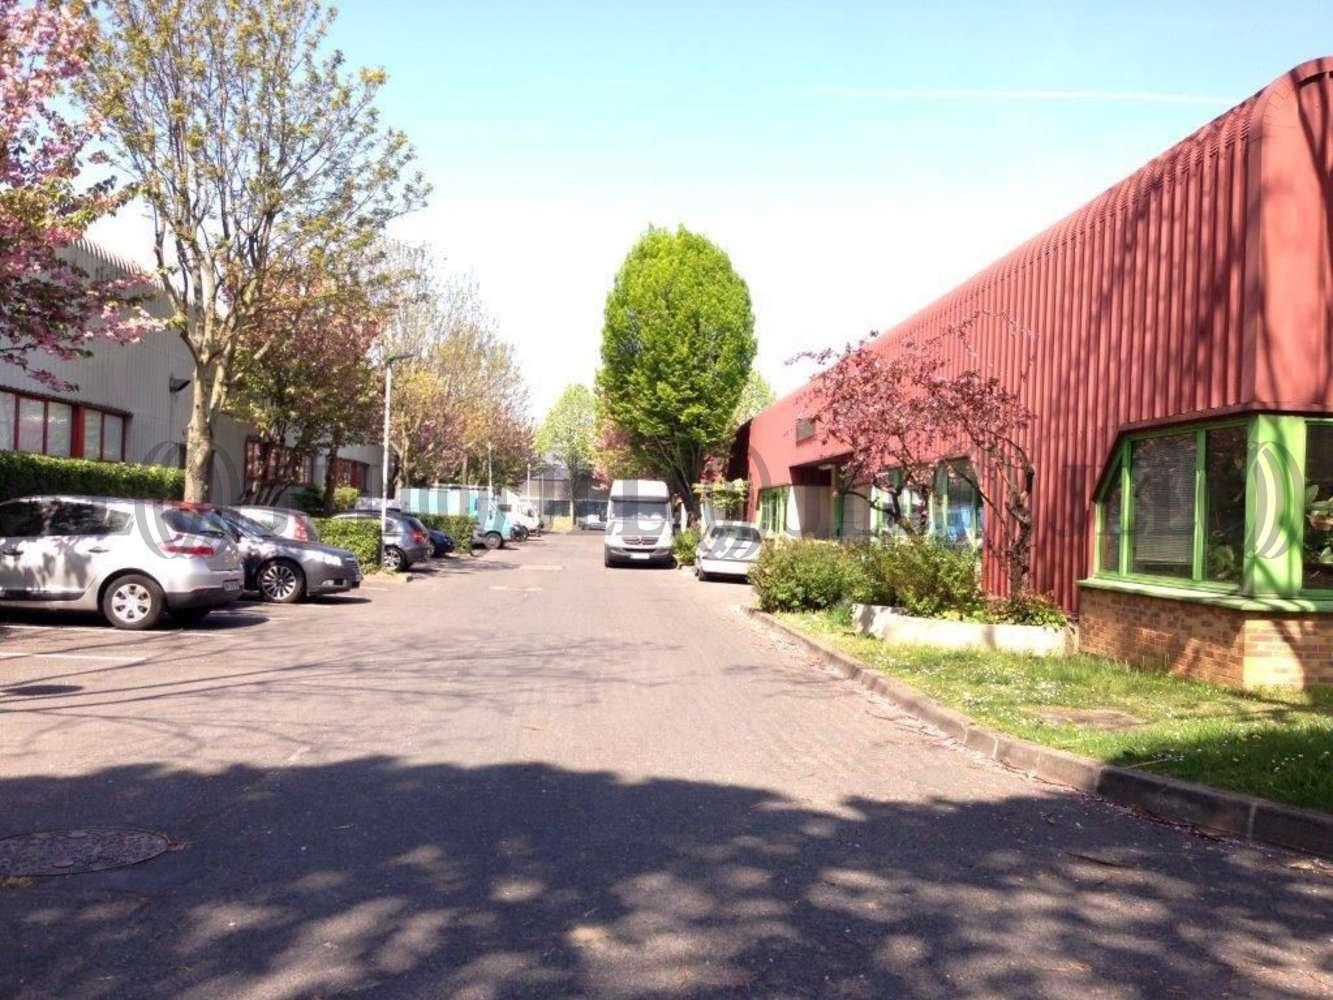 Plateformes logistiques Le blanc mesnil, 93150 - 19 AVENUE ALBERT EINSTEIN